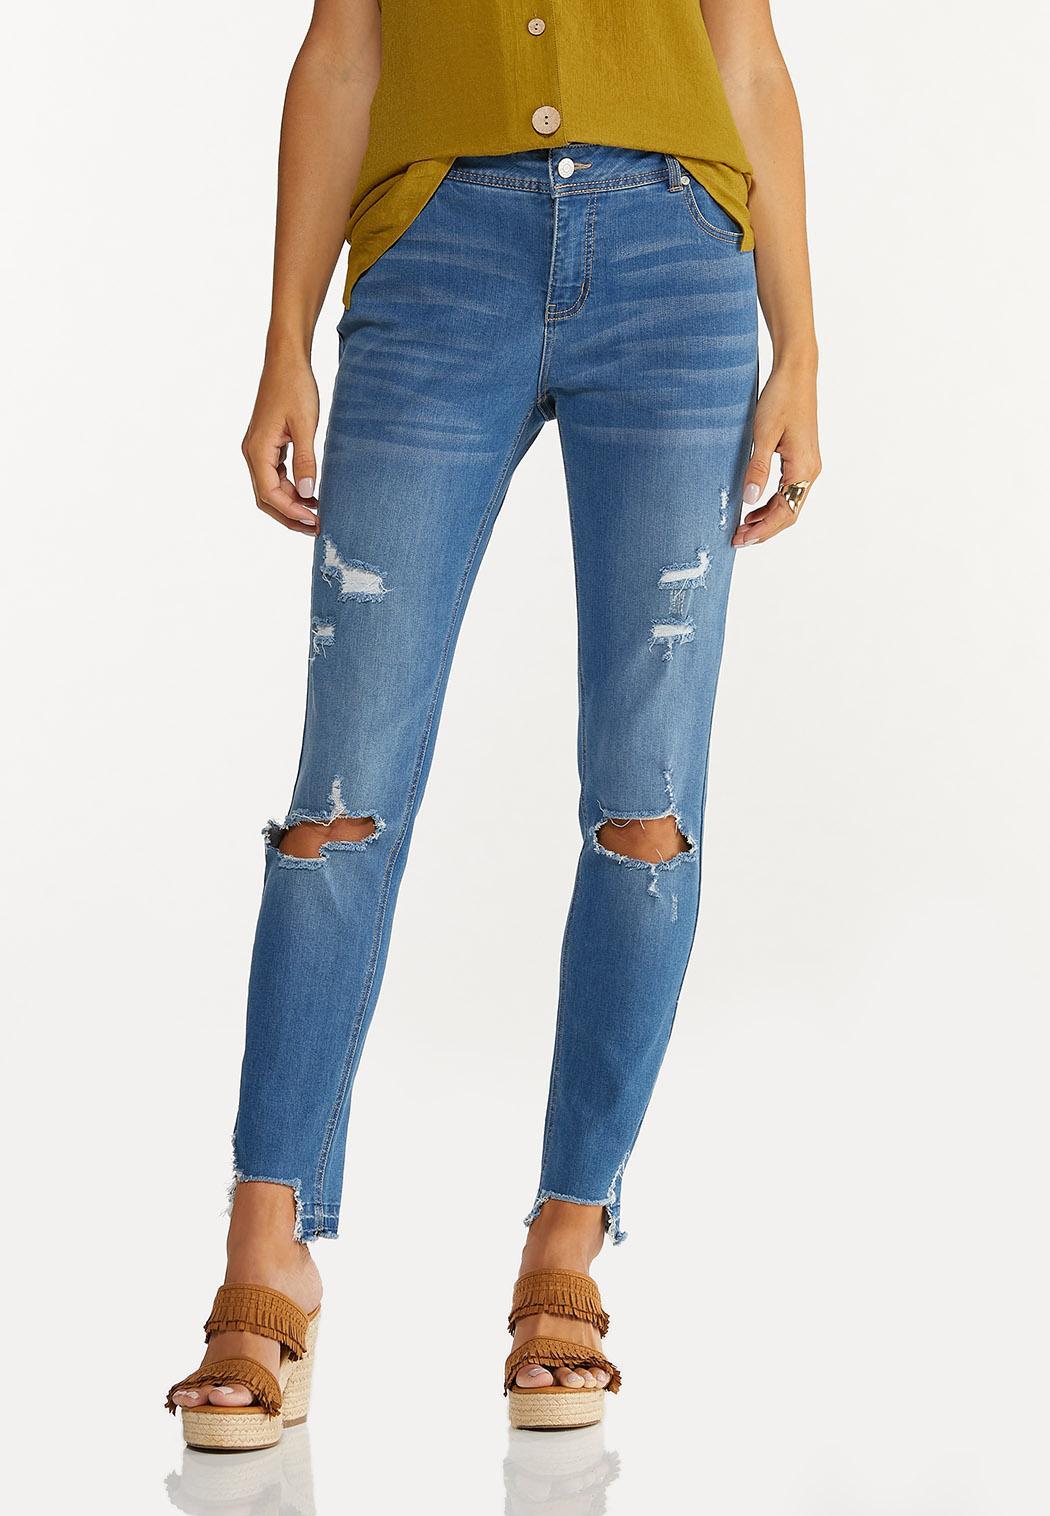 Curvy Distressed Jeans